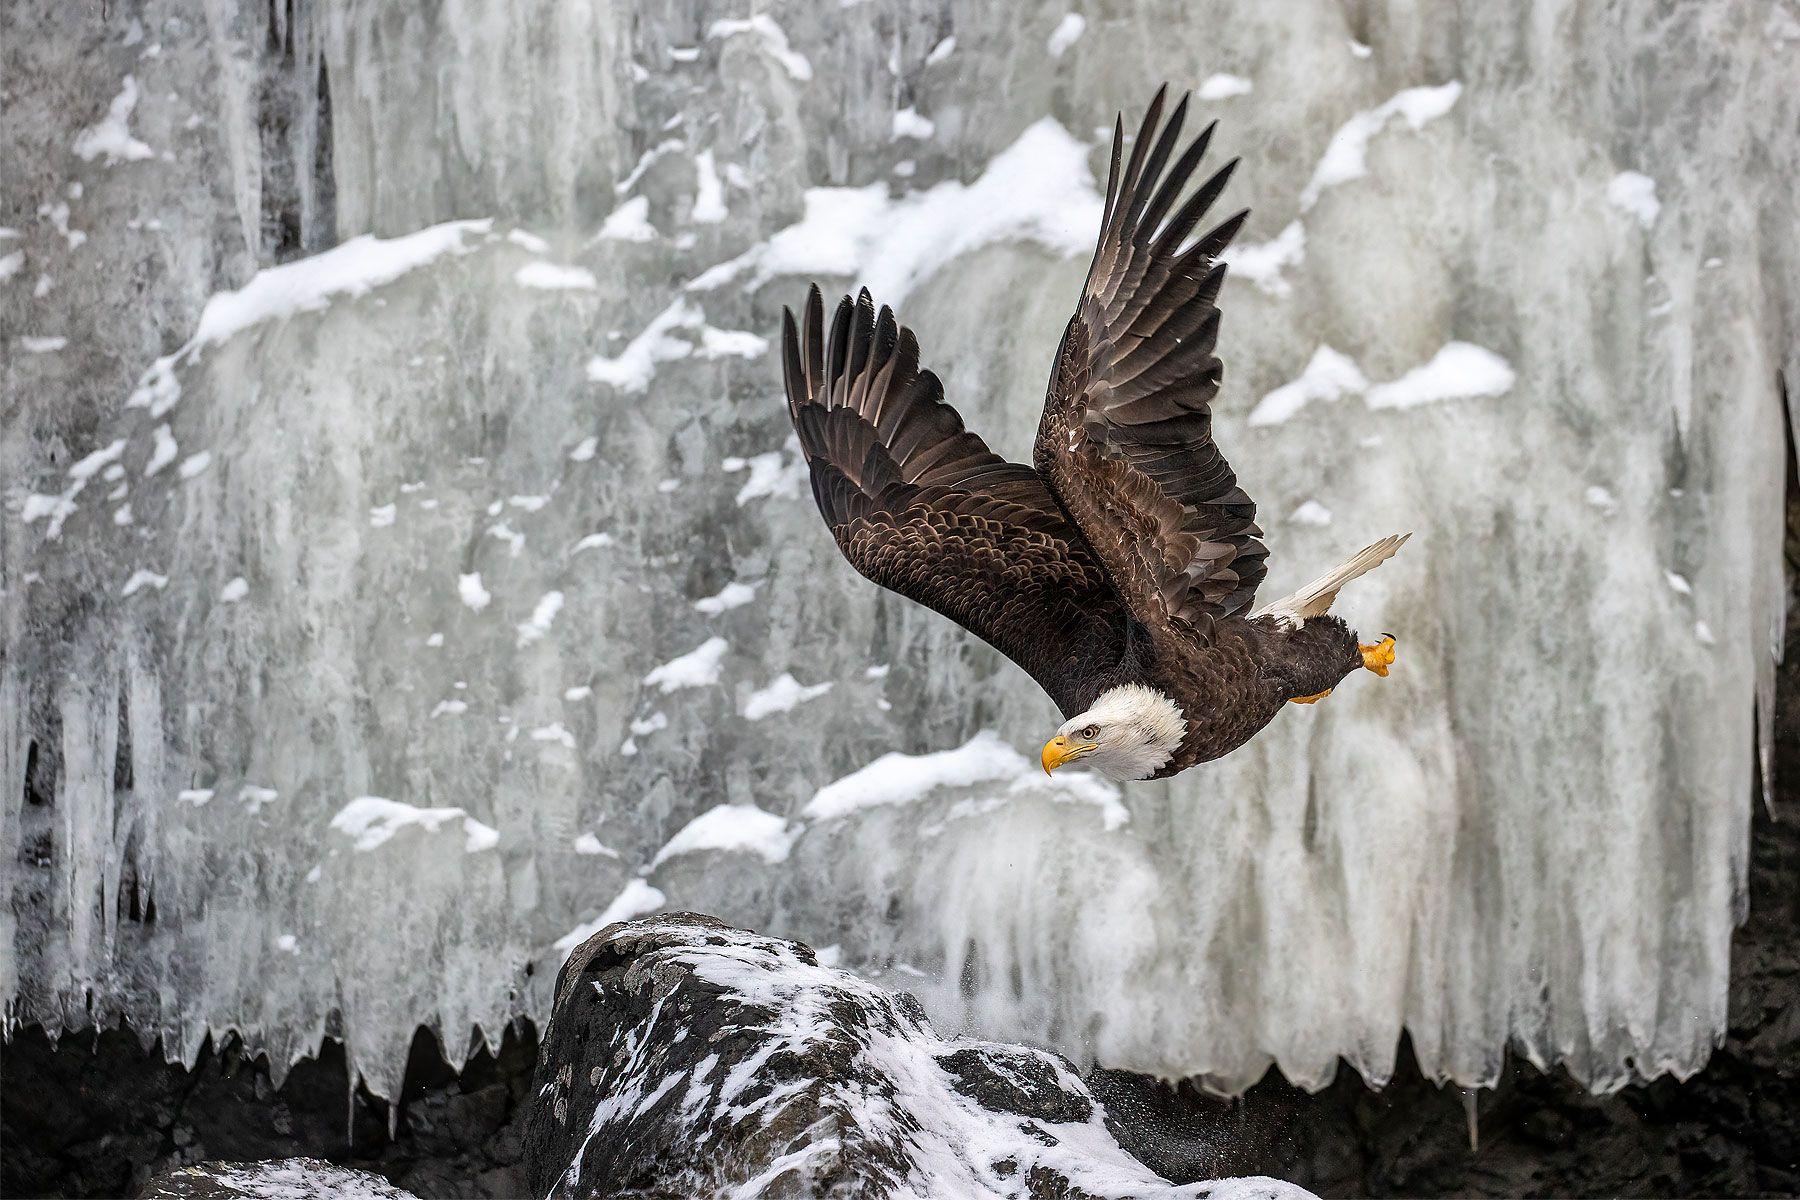 Bald-eagle-flying-by-frozen-ice-waterfall_74I0370-Kachemak-Bay,-Alaska,-USA.jpg